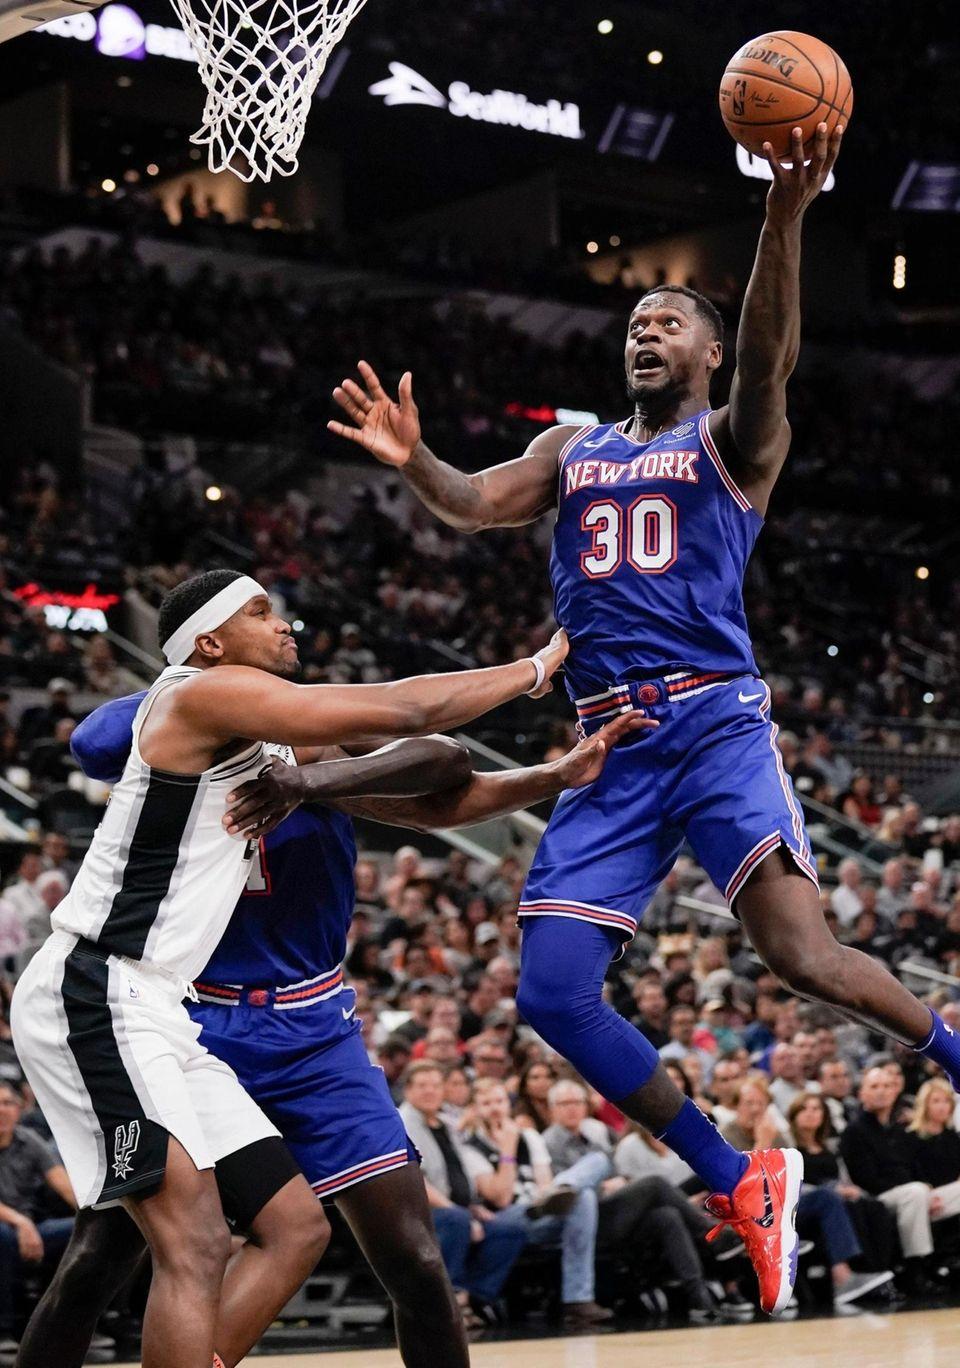 The Knicks' Julius Randle shoots over the San